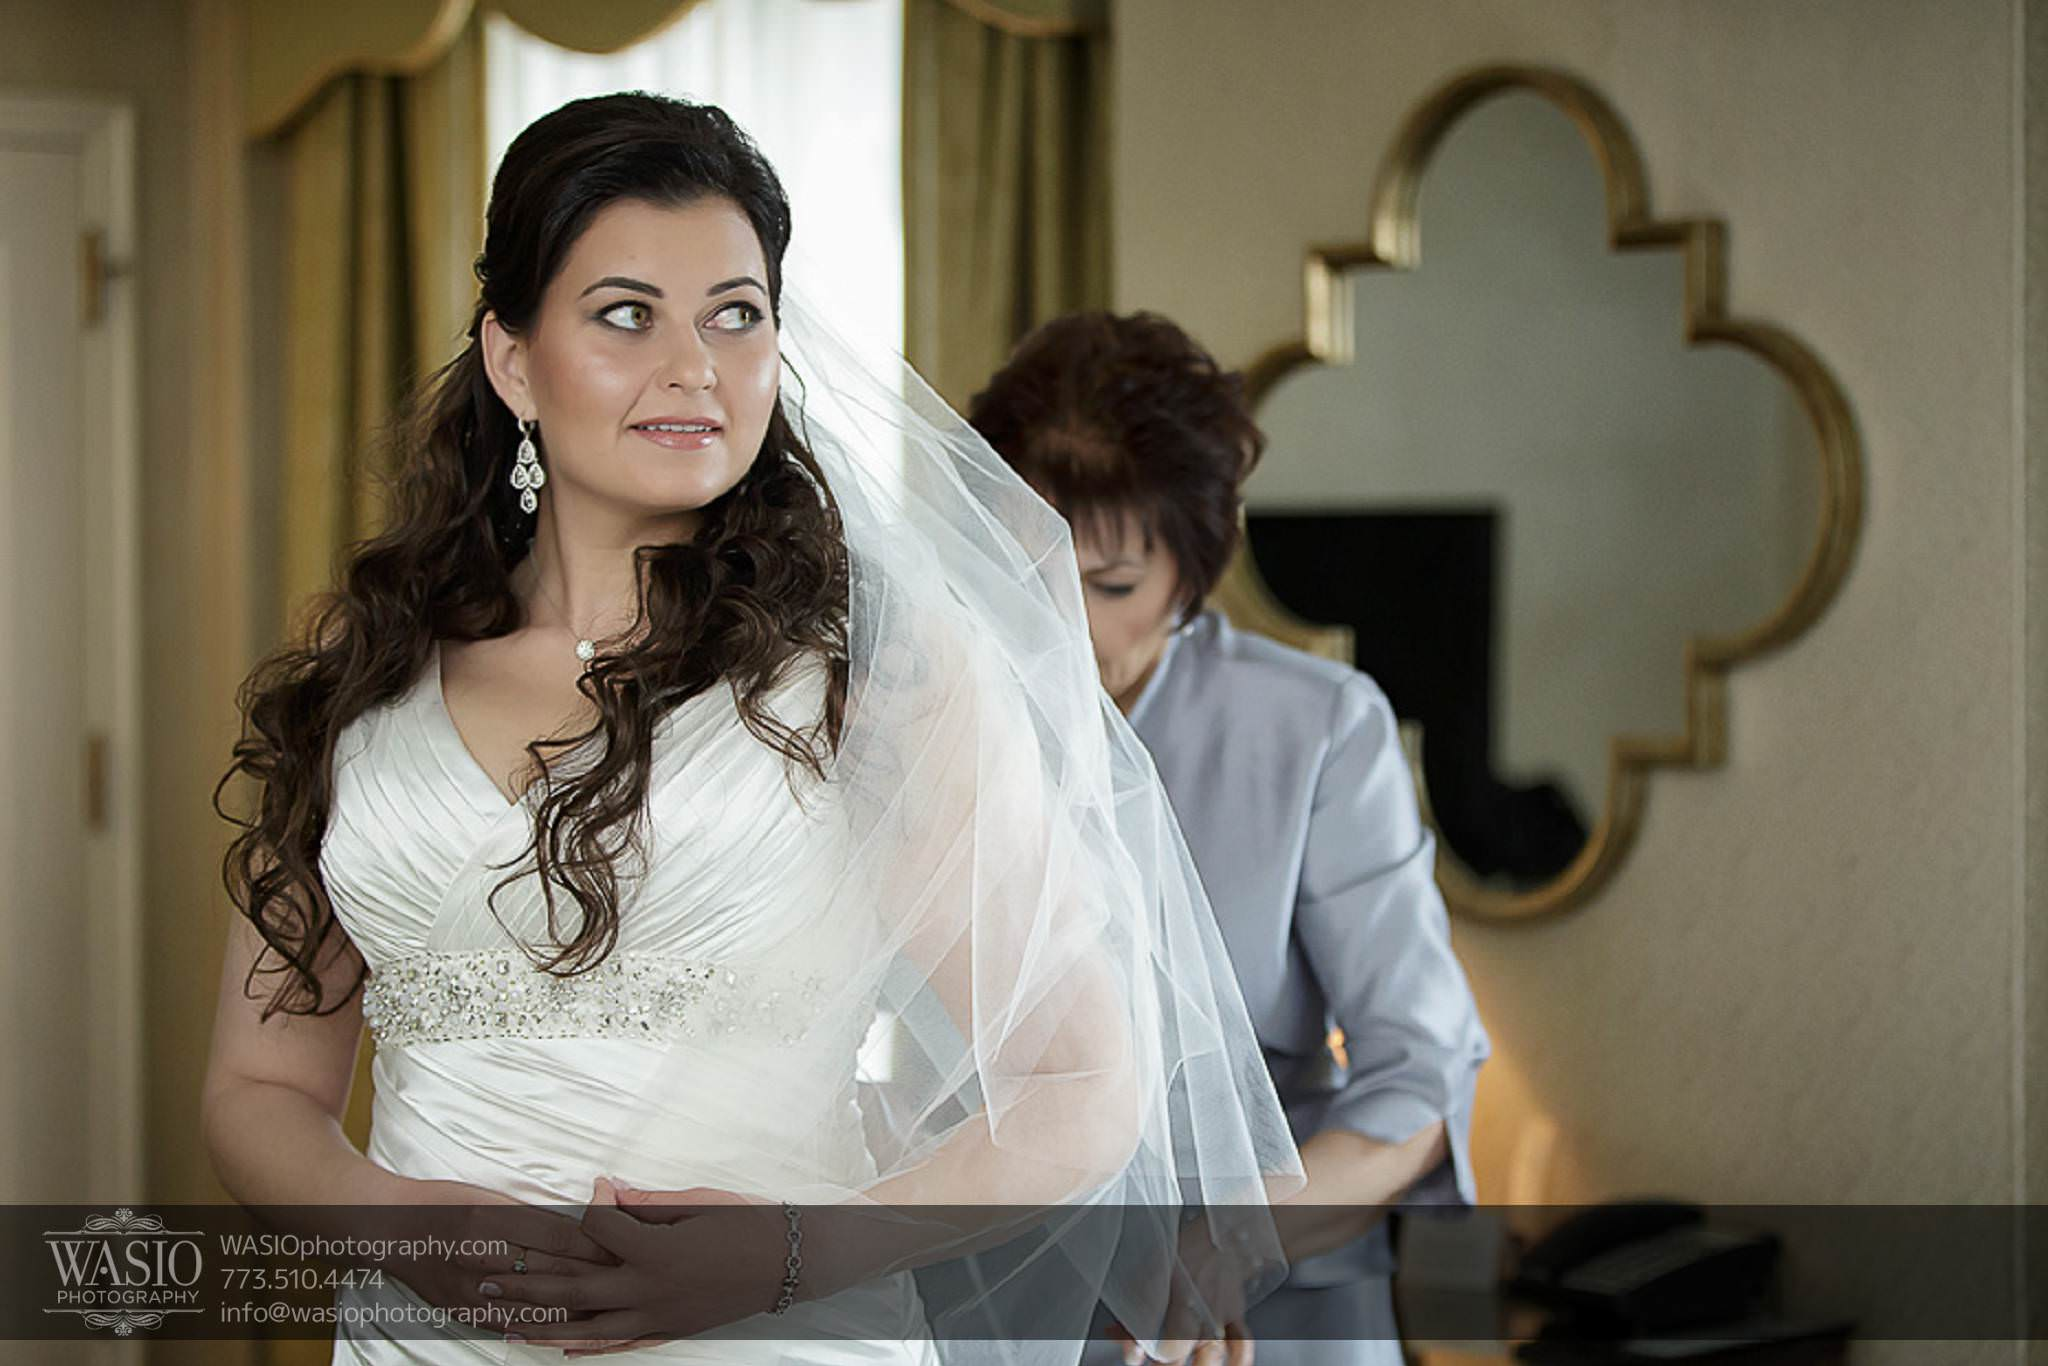 Chicago-wedding-photos-bride-mother-dressed-excited-046 Chicago Wedding Photos - Svetlana + Yuriy